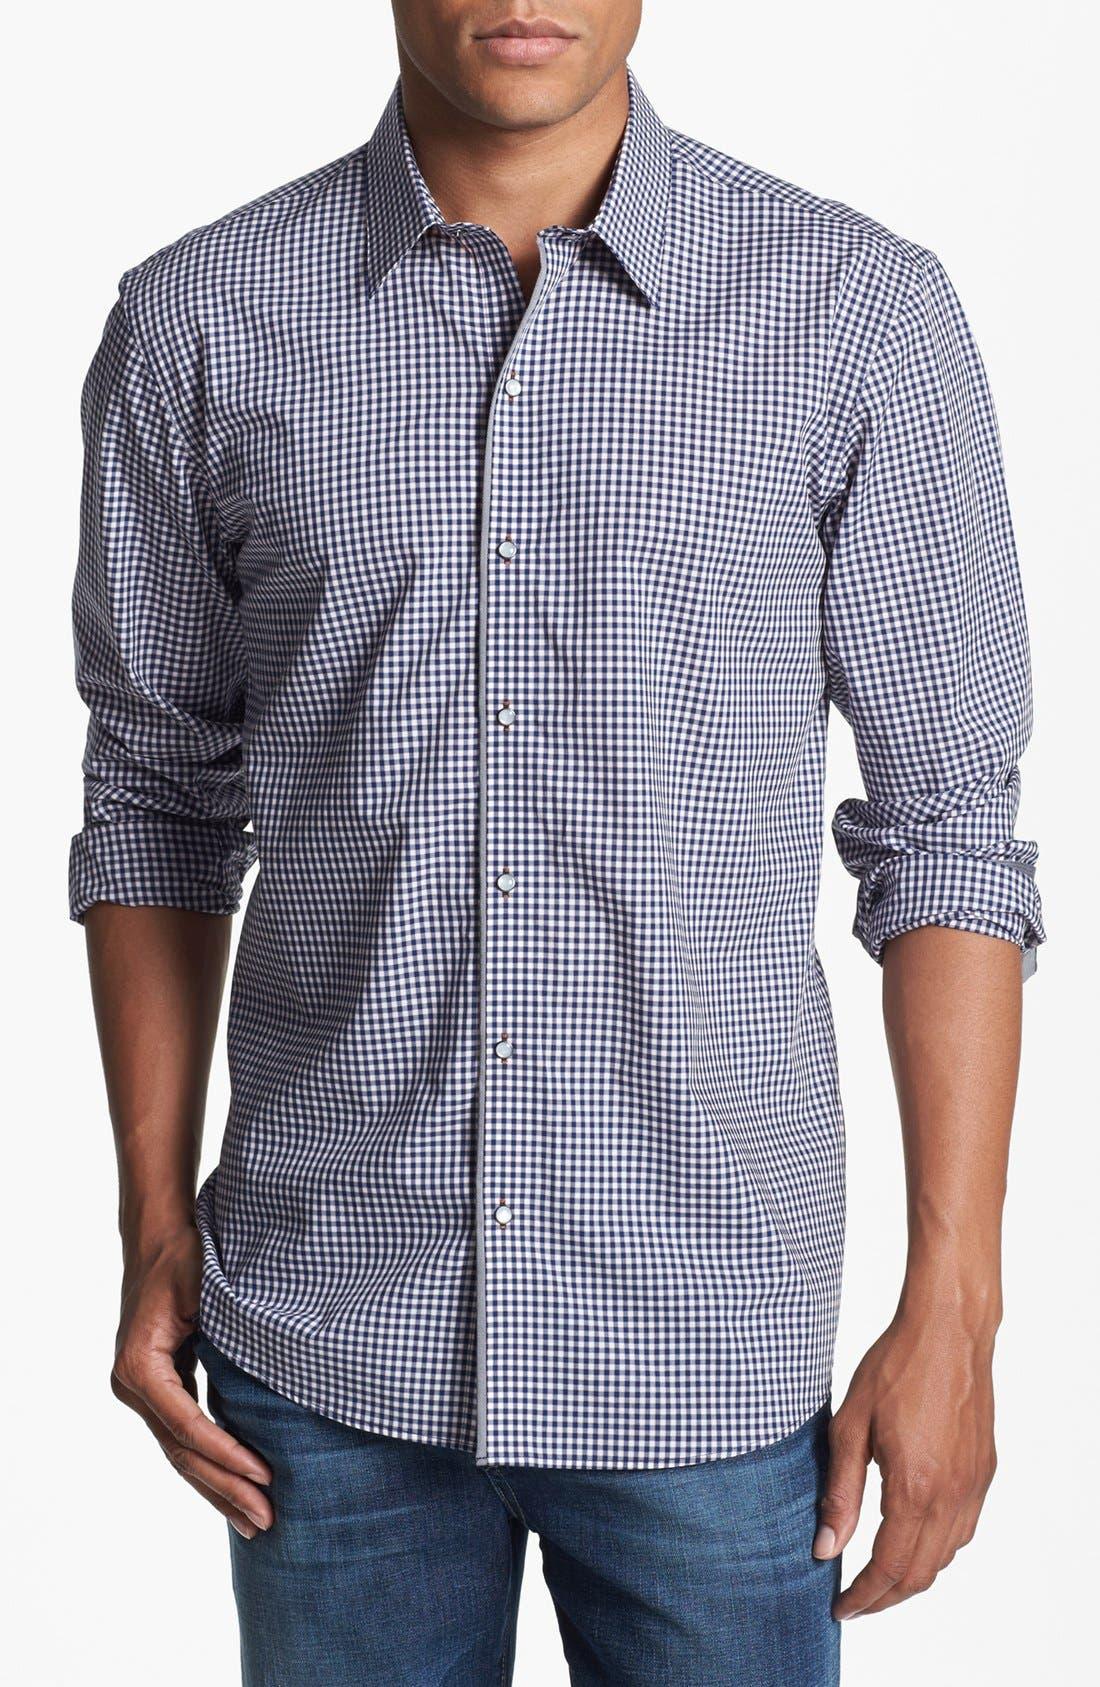 Main Image - 7 Diamonds 'Good Time' Gingham Trim Fit Cotton Sport Shirt